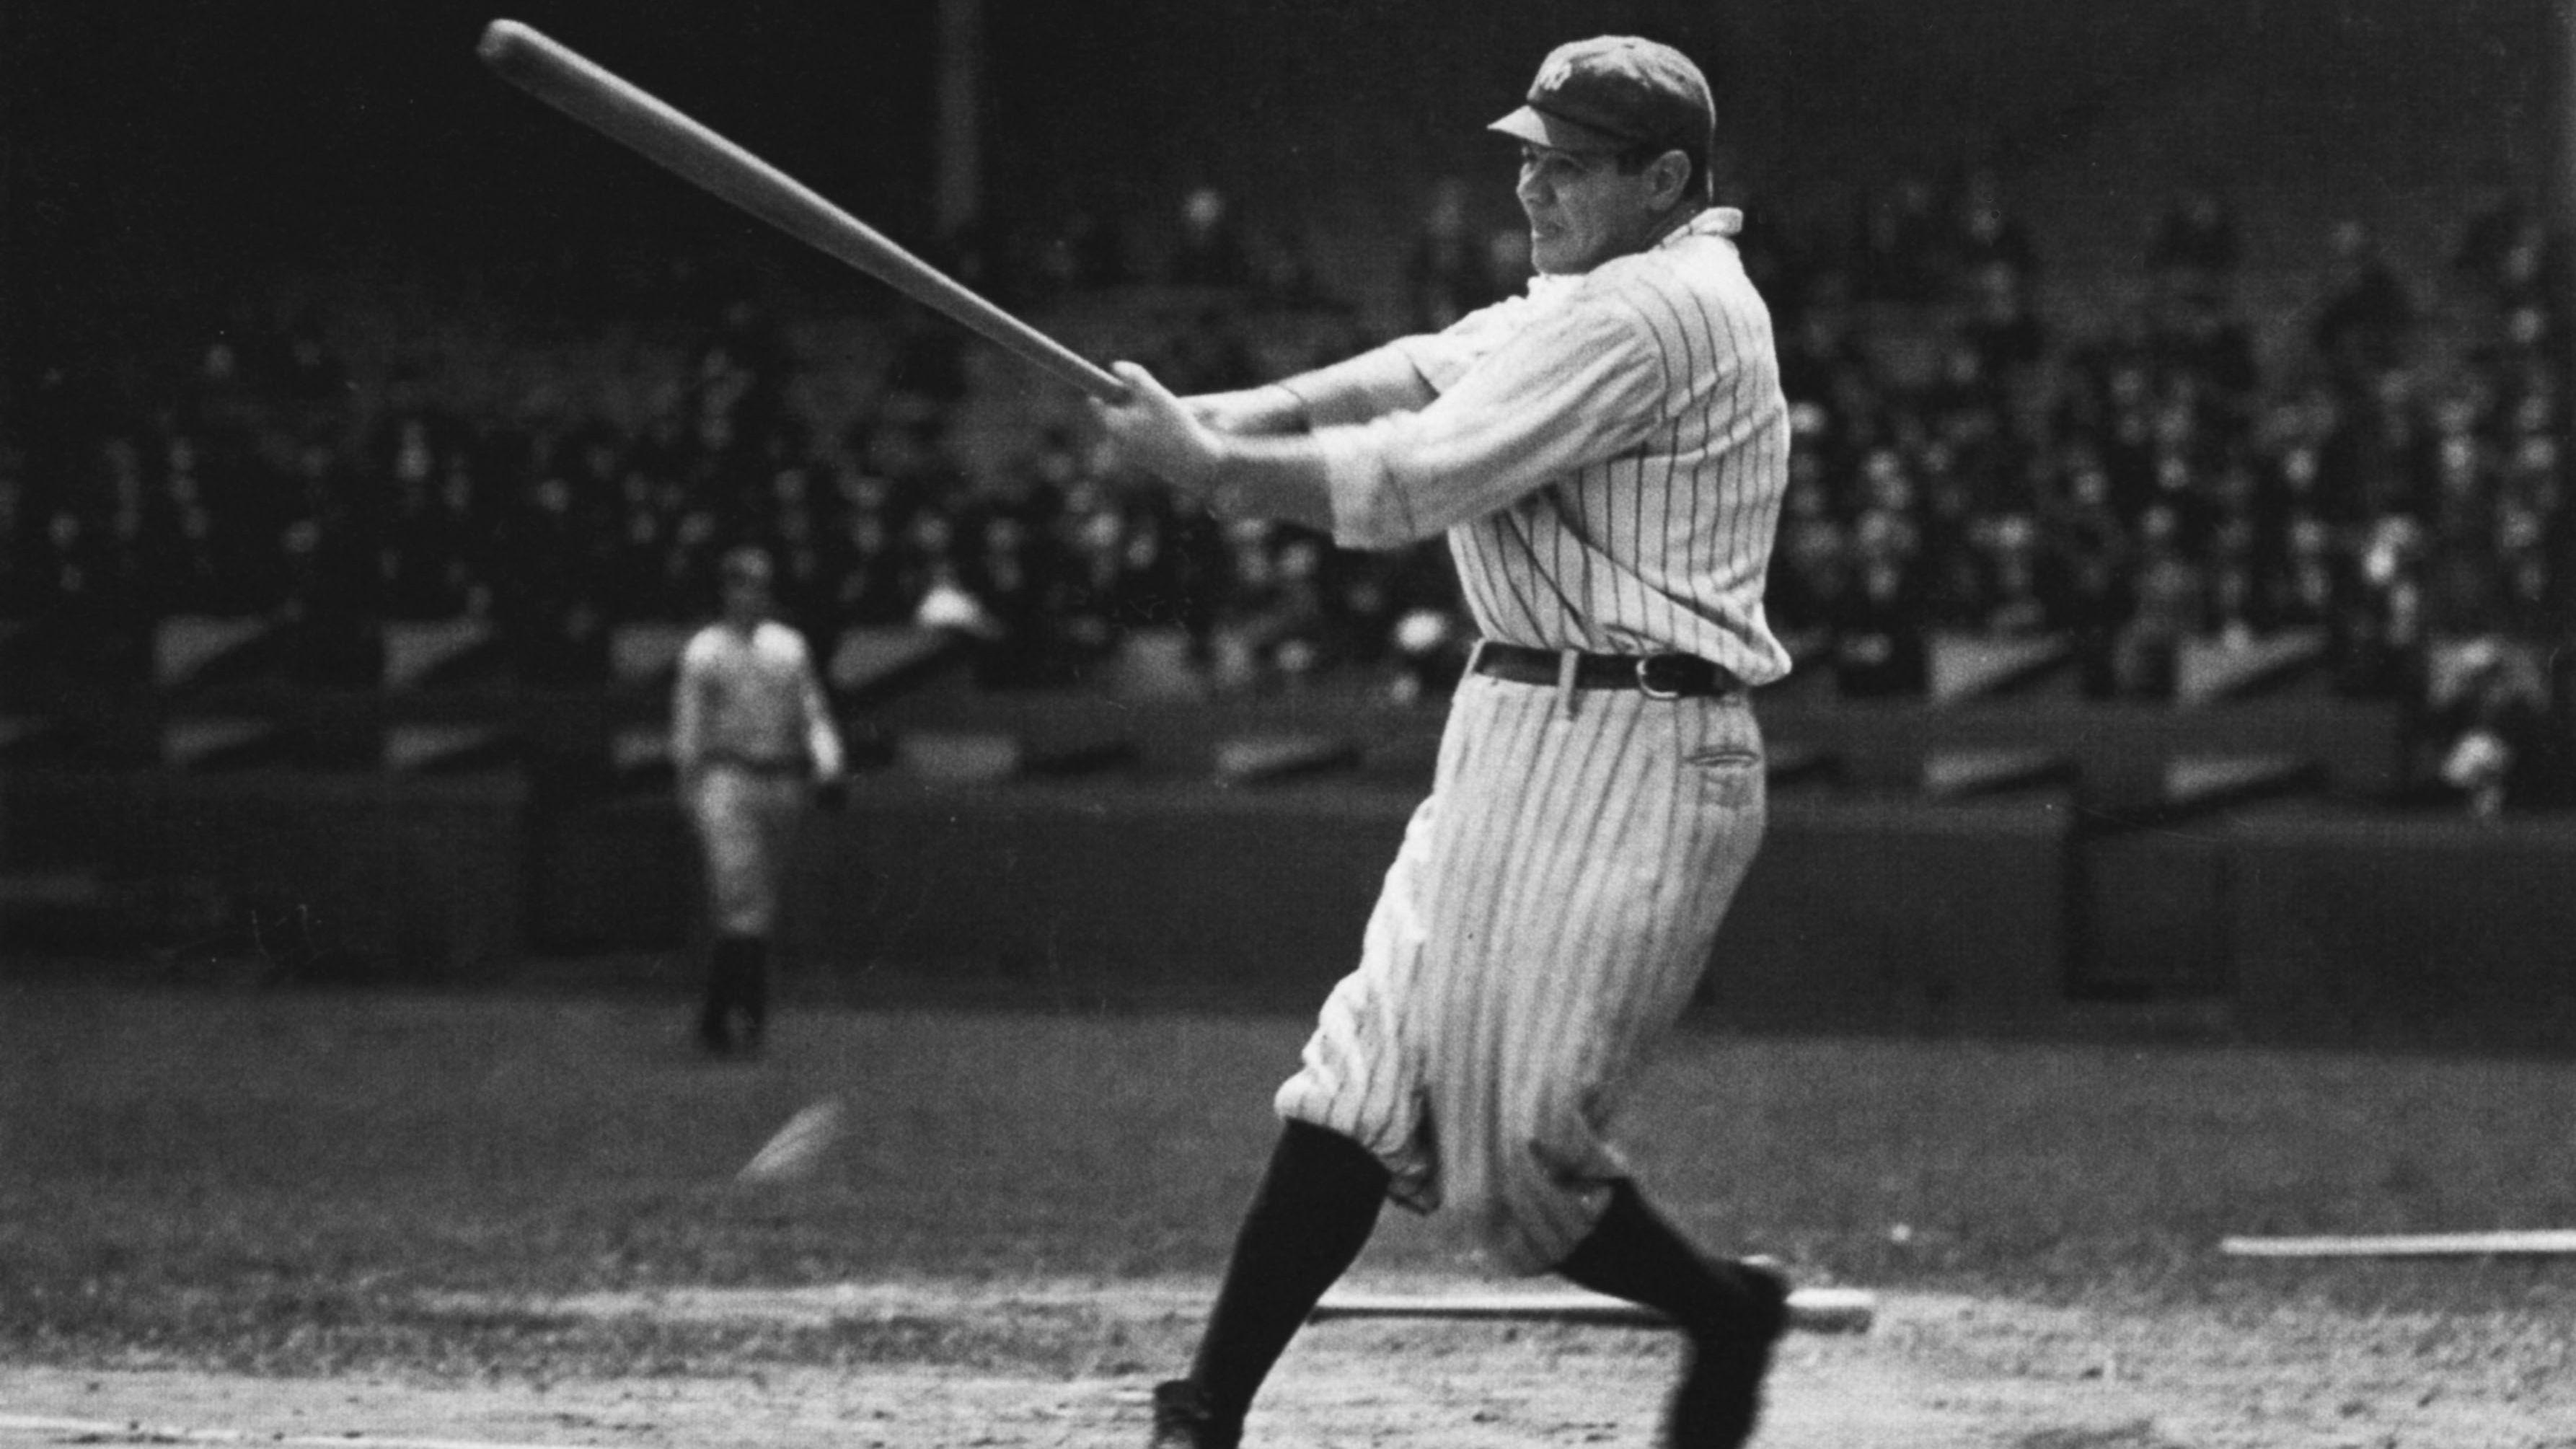 Biography of Babe Ruth, Home Run King